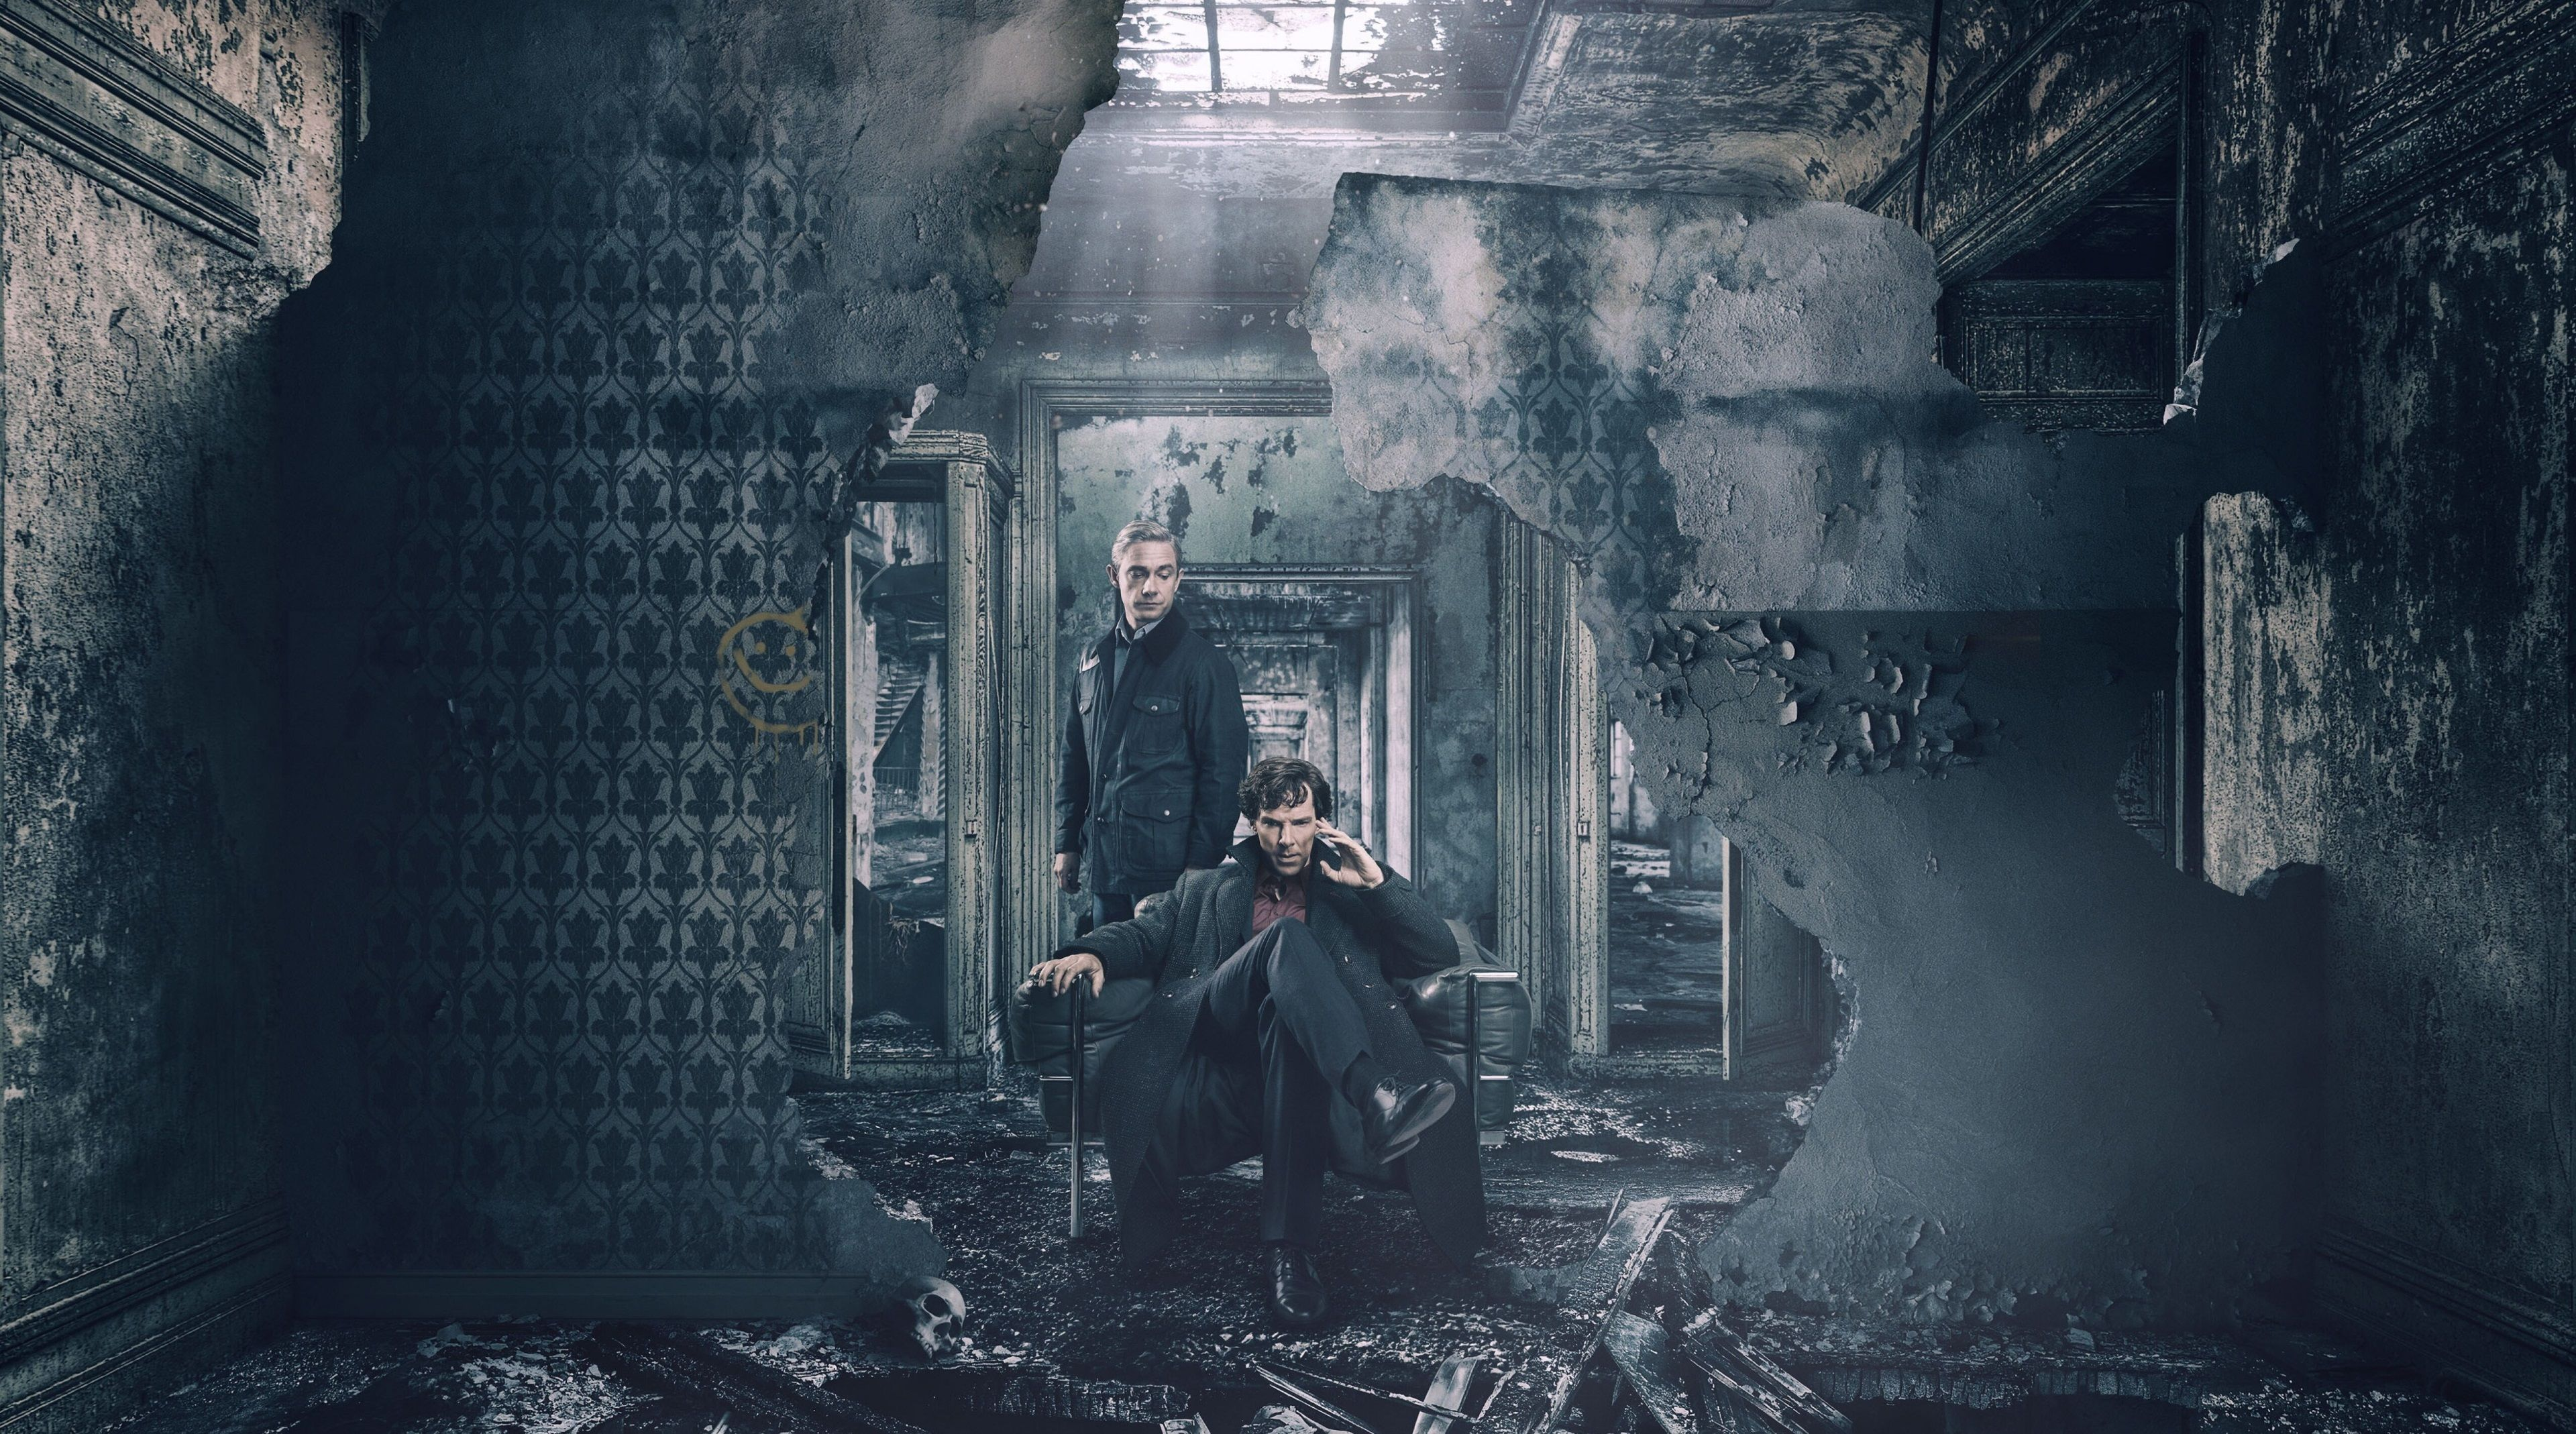 3840x2138 Sherlock Season 4 4k Desktop Wallpaper Hd Quality